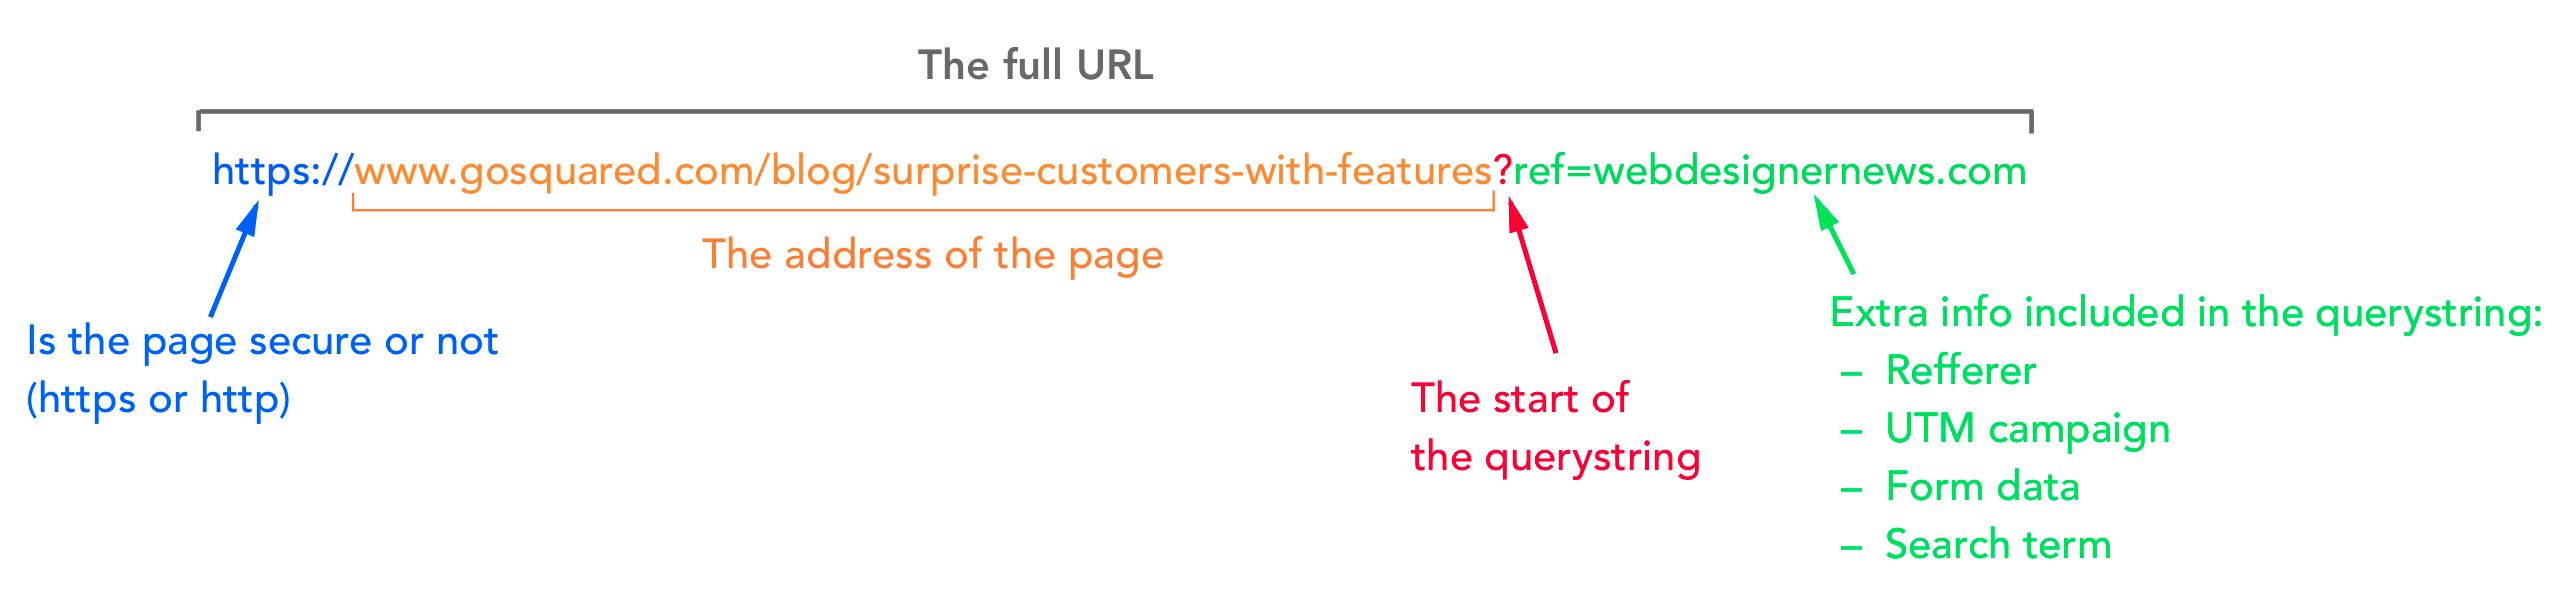 querystring example